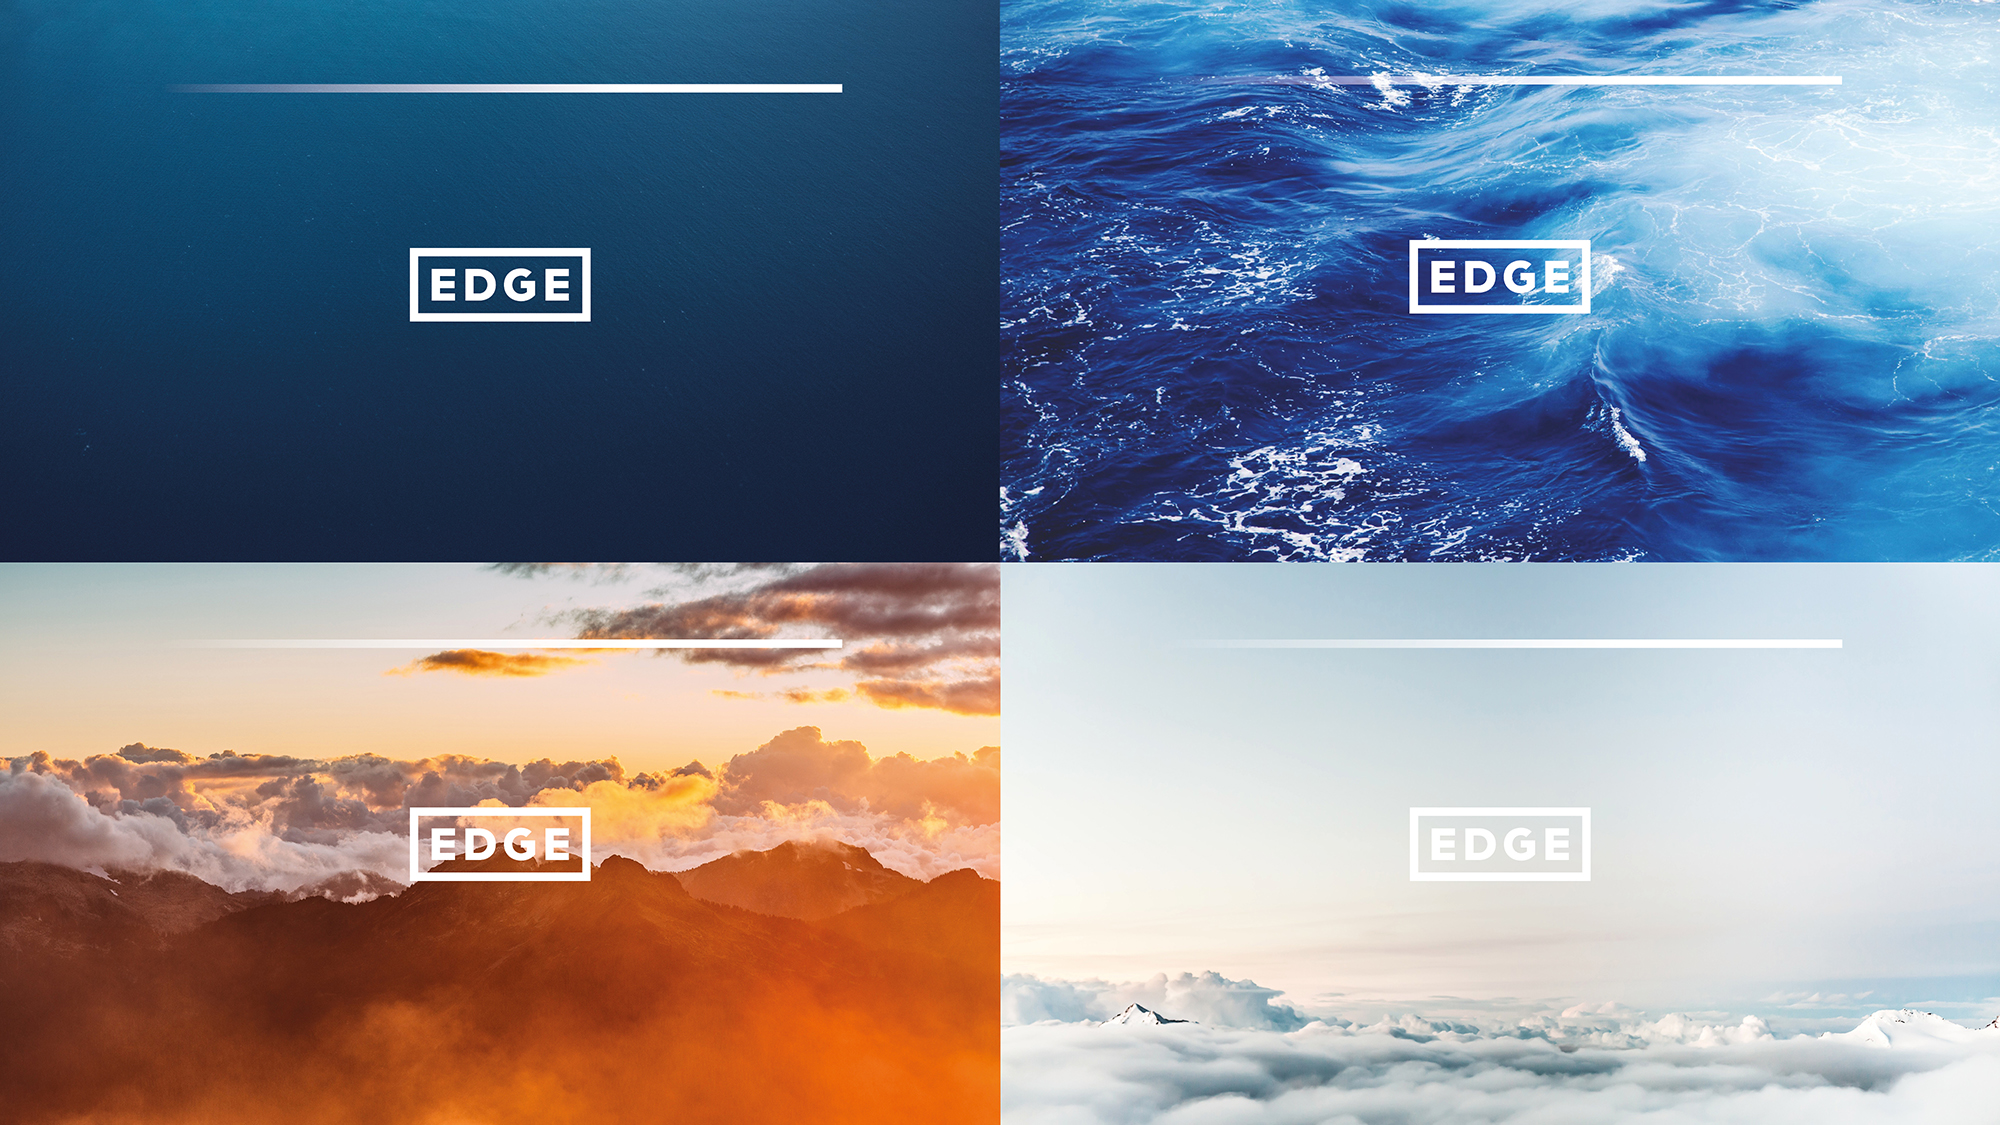 Edge_Launch_DM620.jpg